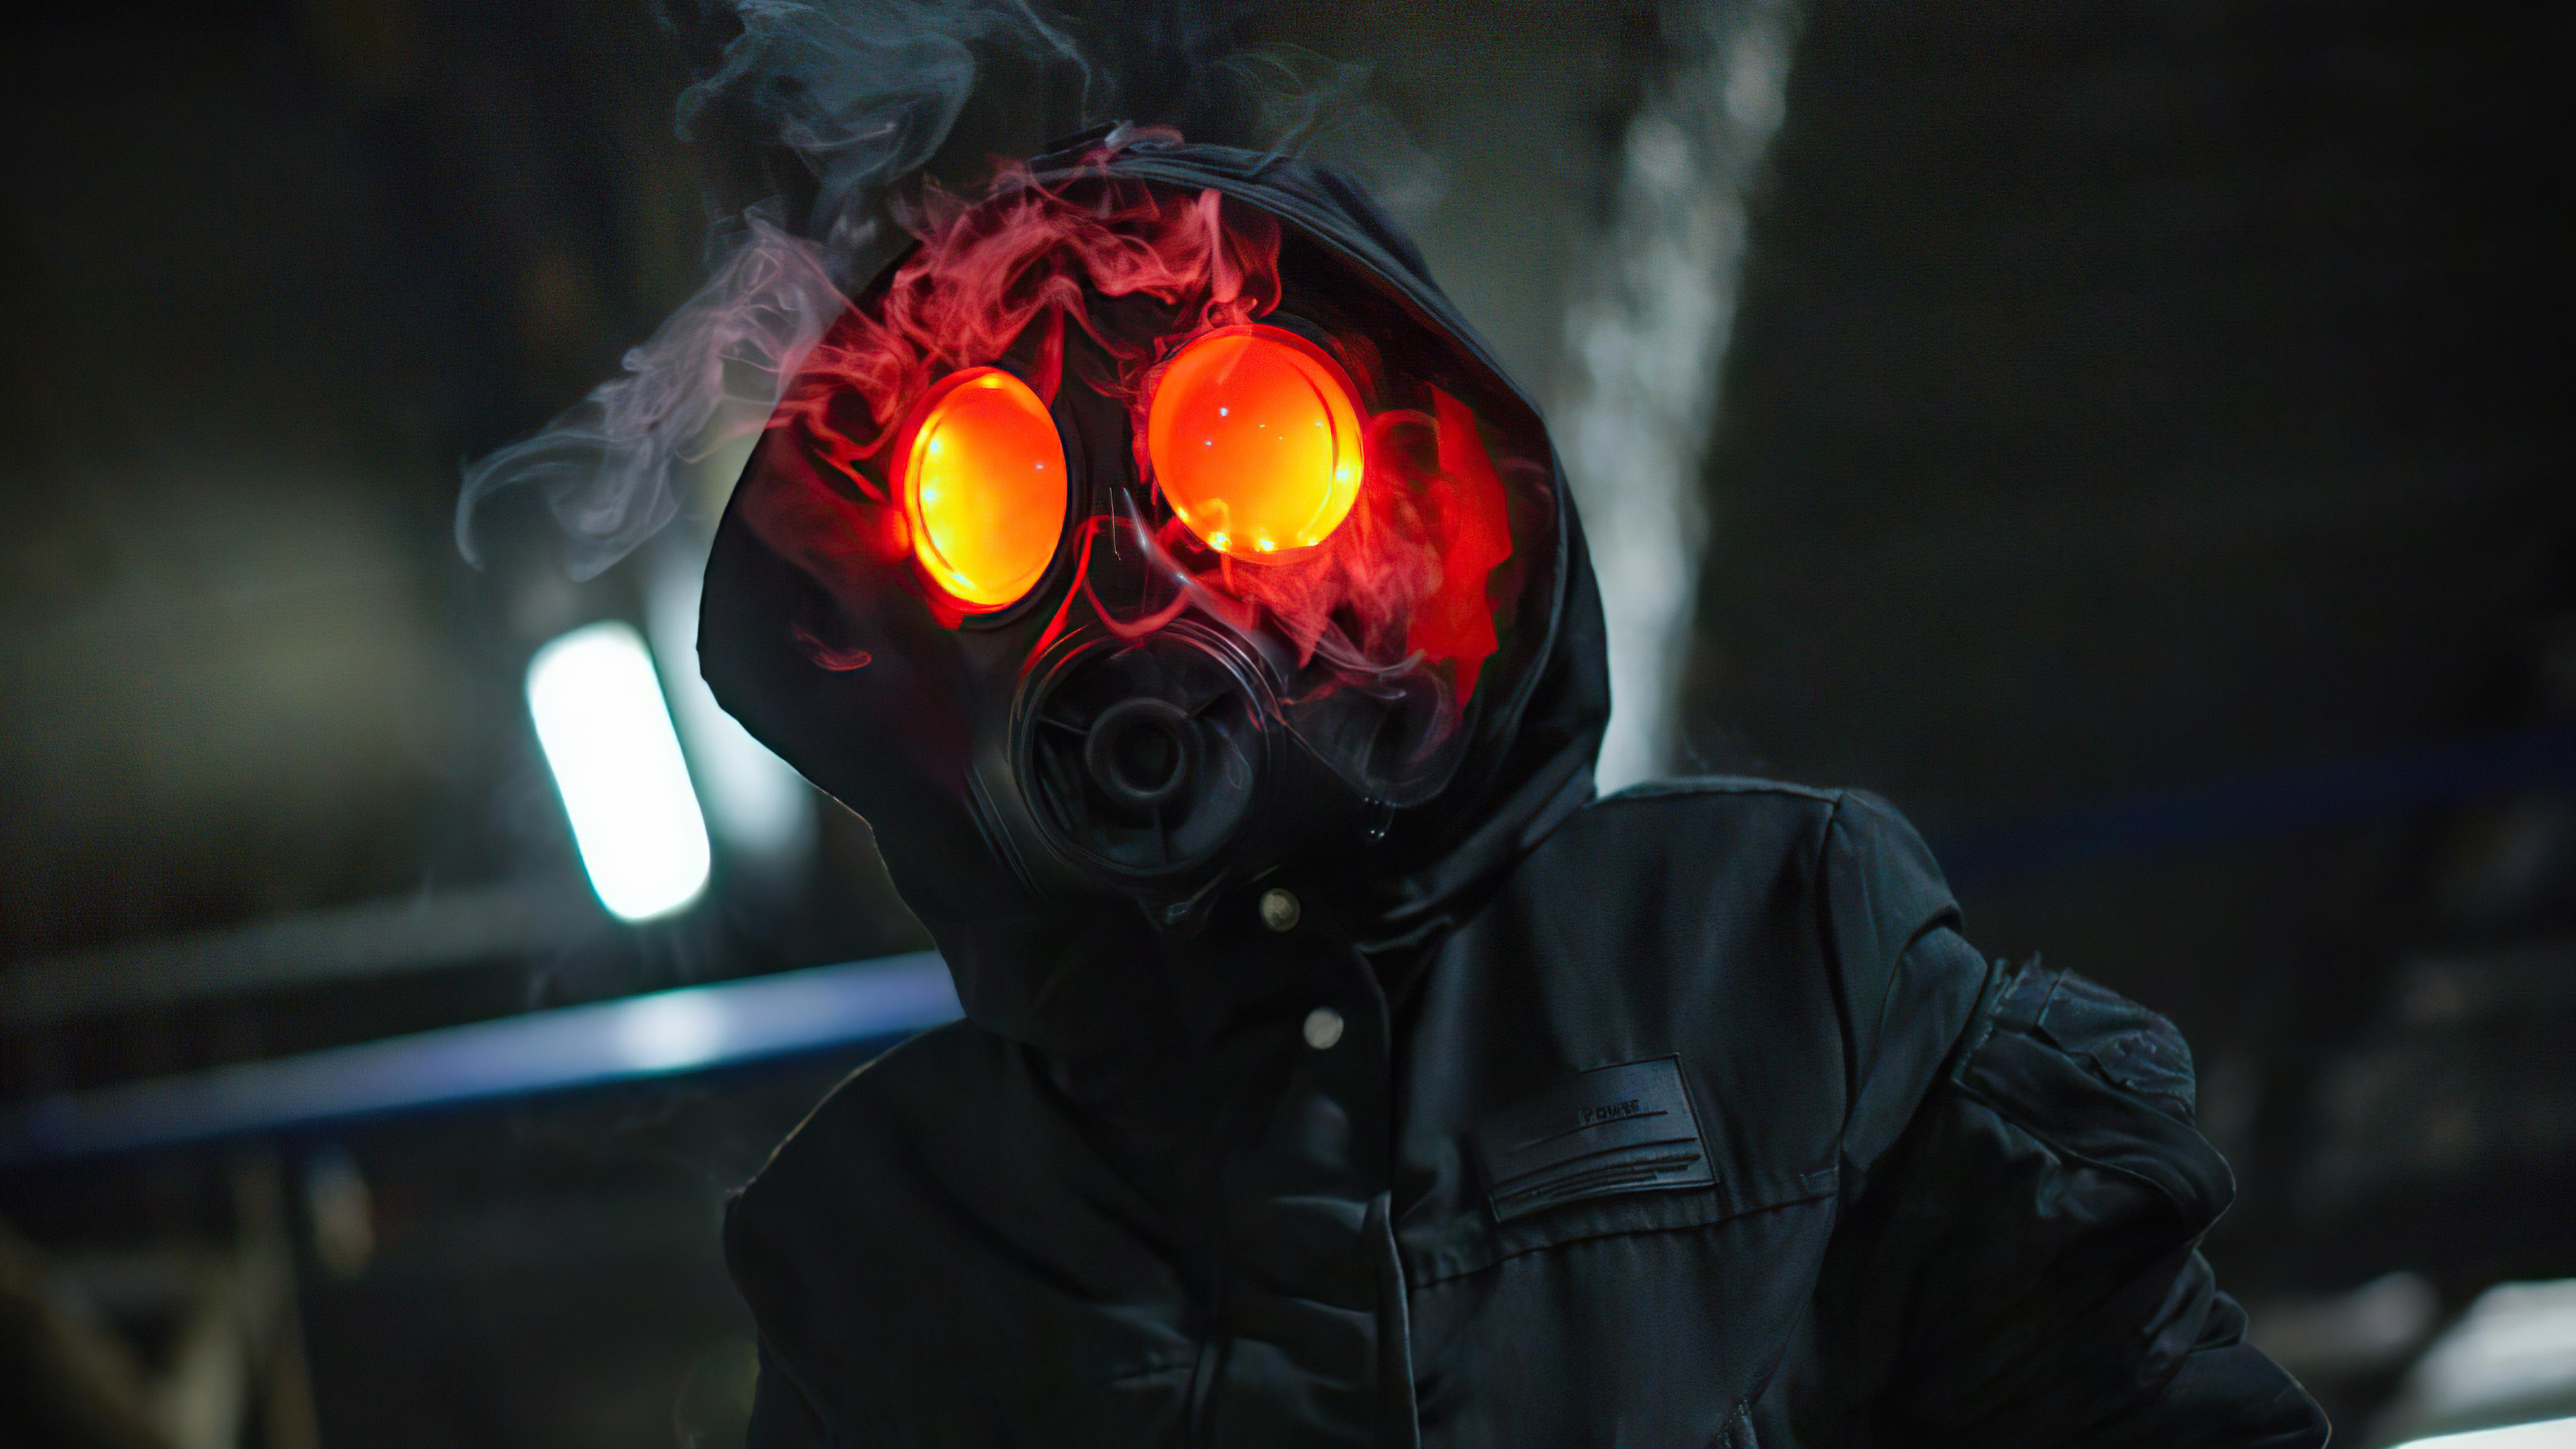 dark smoke mask hoodie boy 4k 1618131711 - Dark Smoke Mask Hoodie Boy 4k - Dark Smoke Mask Hoodie Boy 4k wallpapers